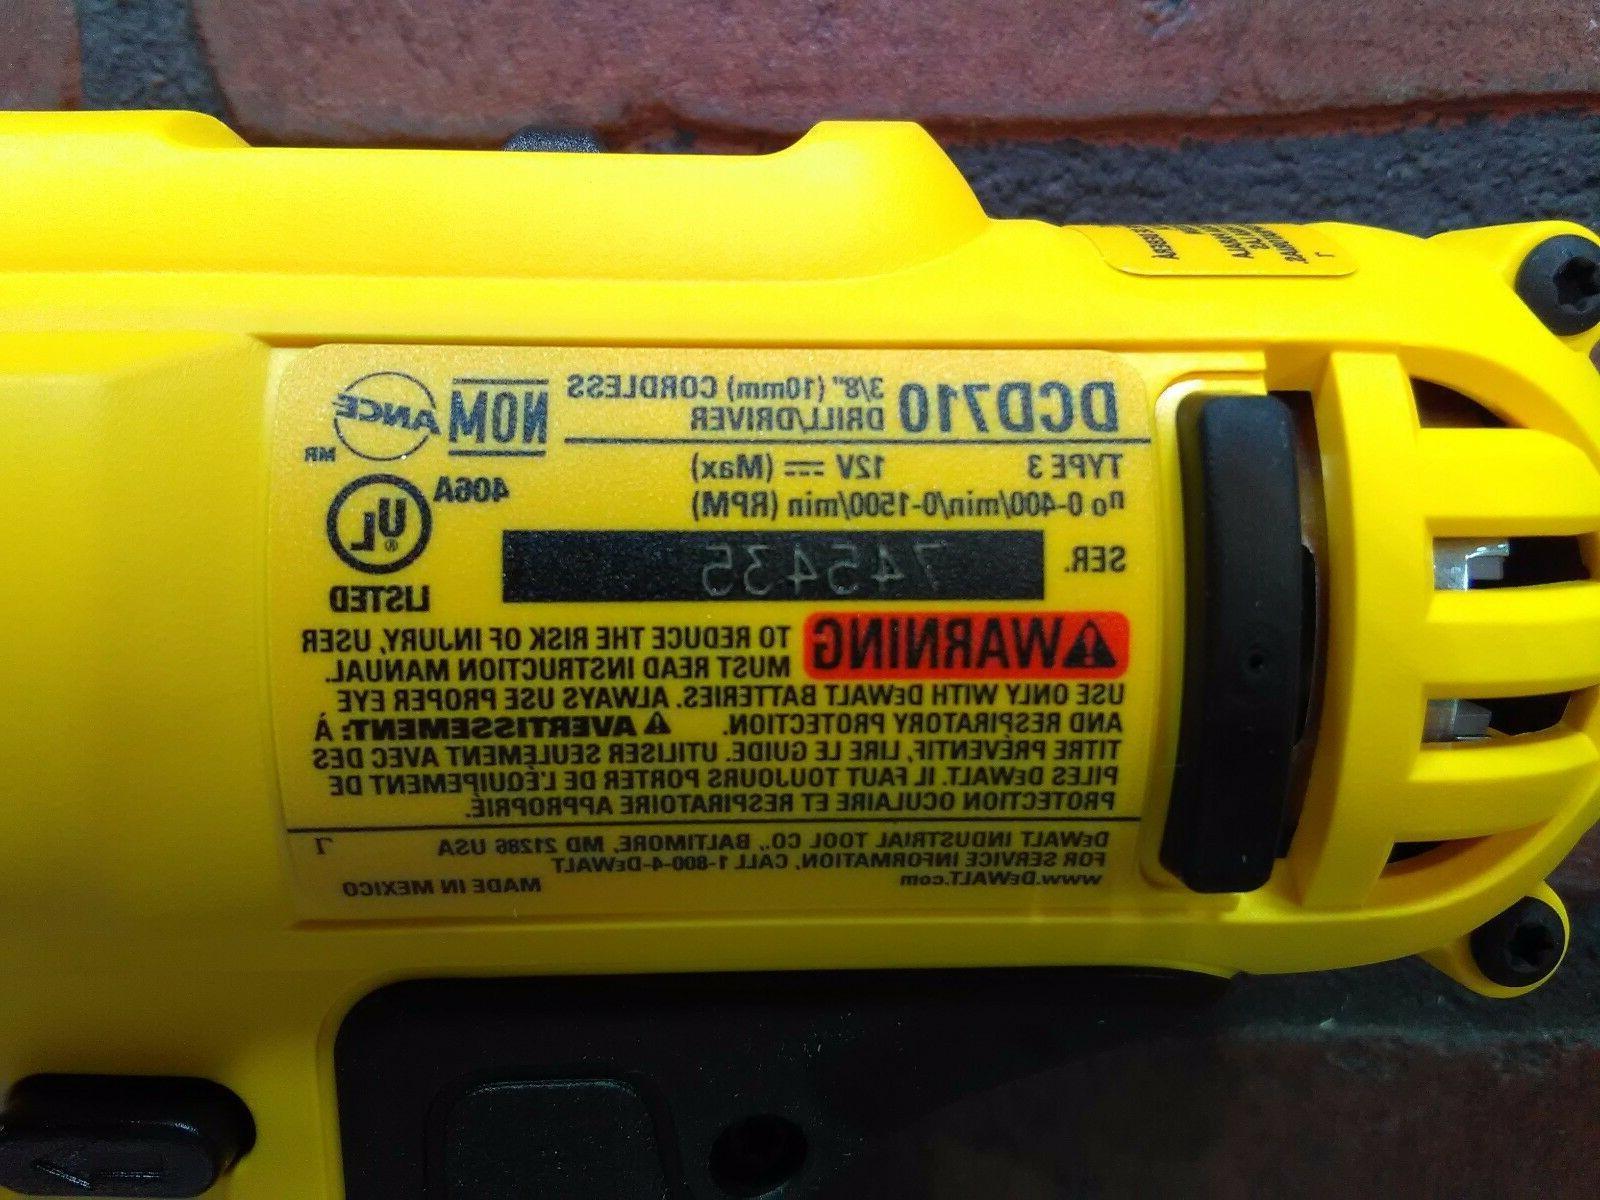 Dewalt DCD710B 12V Cordless 3/8 Drill Driver